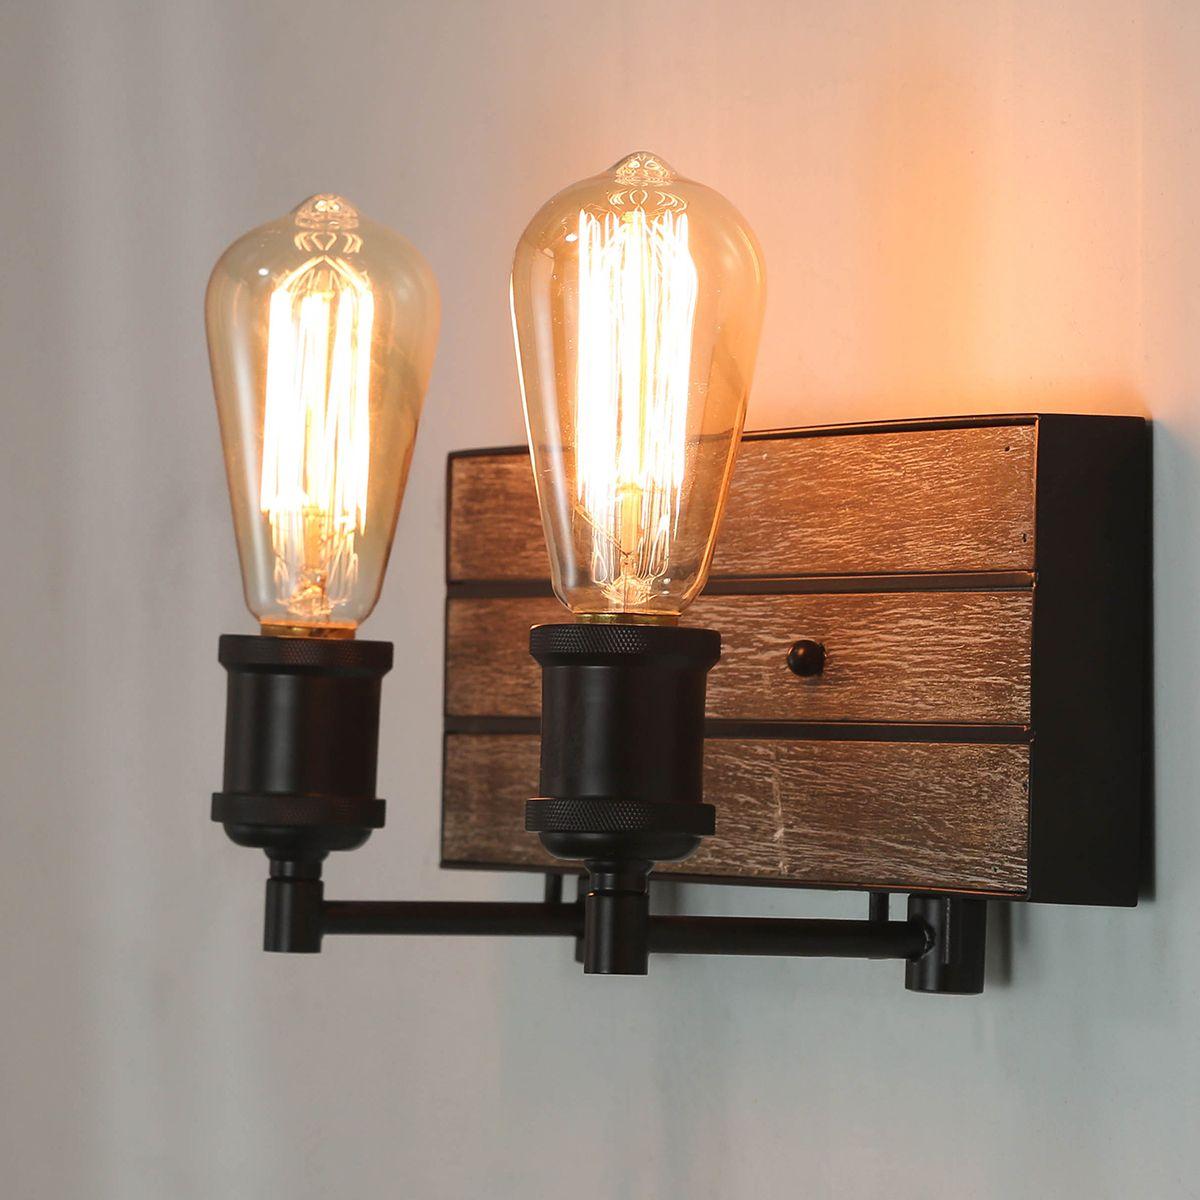 rustic indoor wall lights unusual 2light wall lamps wood indoor sconces lights it is rustic wall vanity